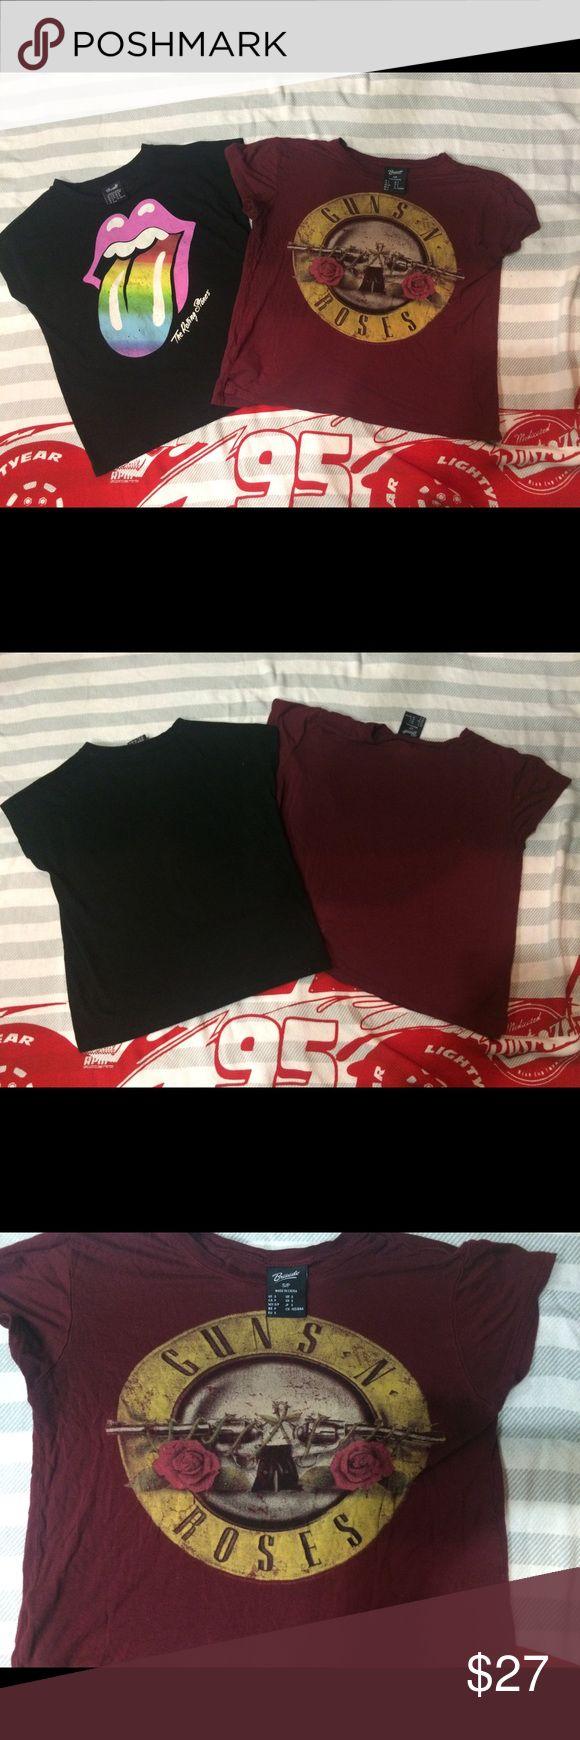 Two band shirts Brand bravado The Rolling Stones US 9/10 Guns N' Roses US S Bravado Tops Tees - Short Sleeve